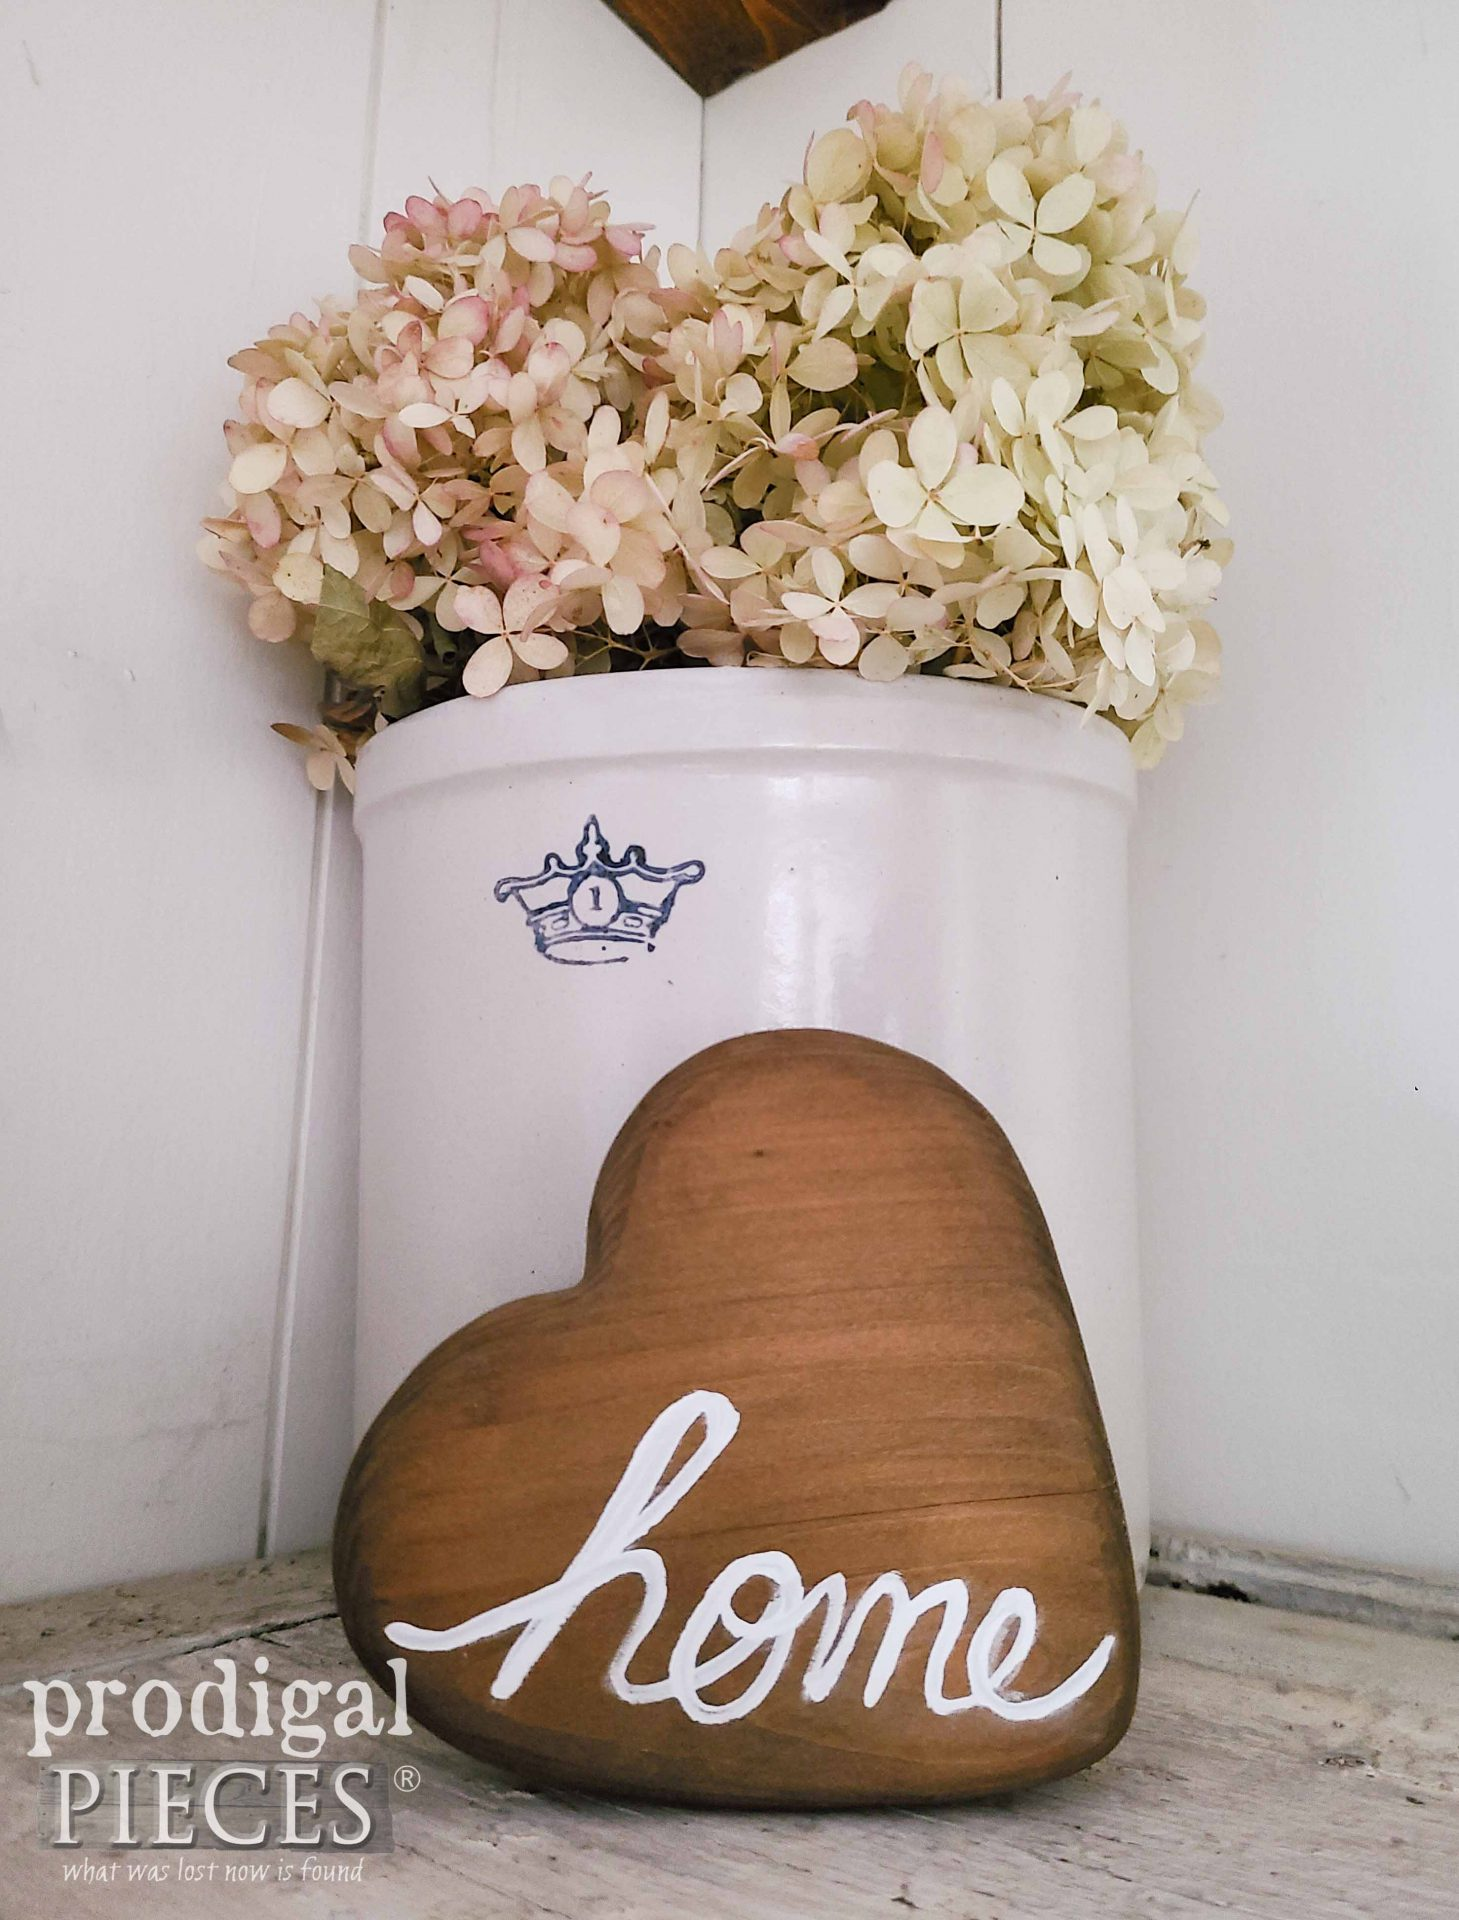 DIY Wooden Heart Home by Larissa of Prodigal Pieces | prodigalpieces.com #prodigalpieces #home #farmhouse #handmade